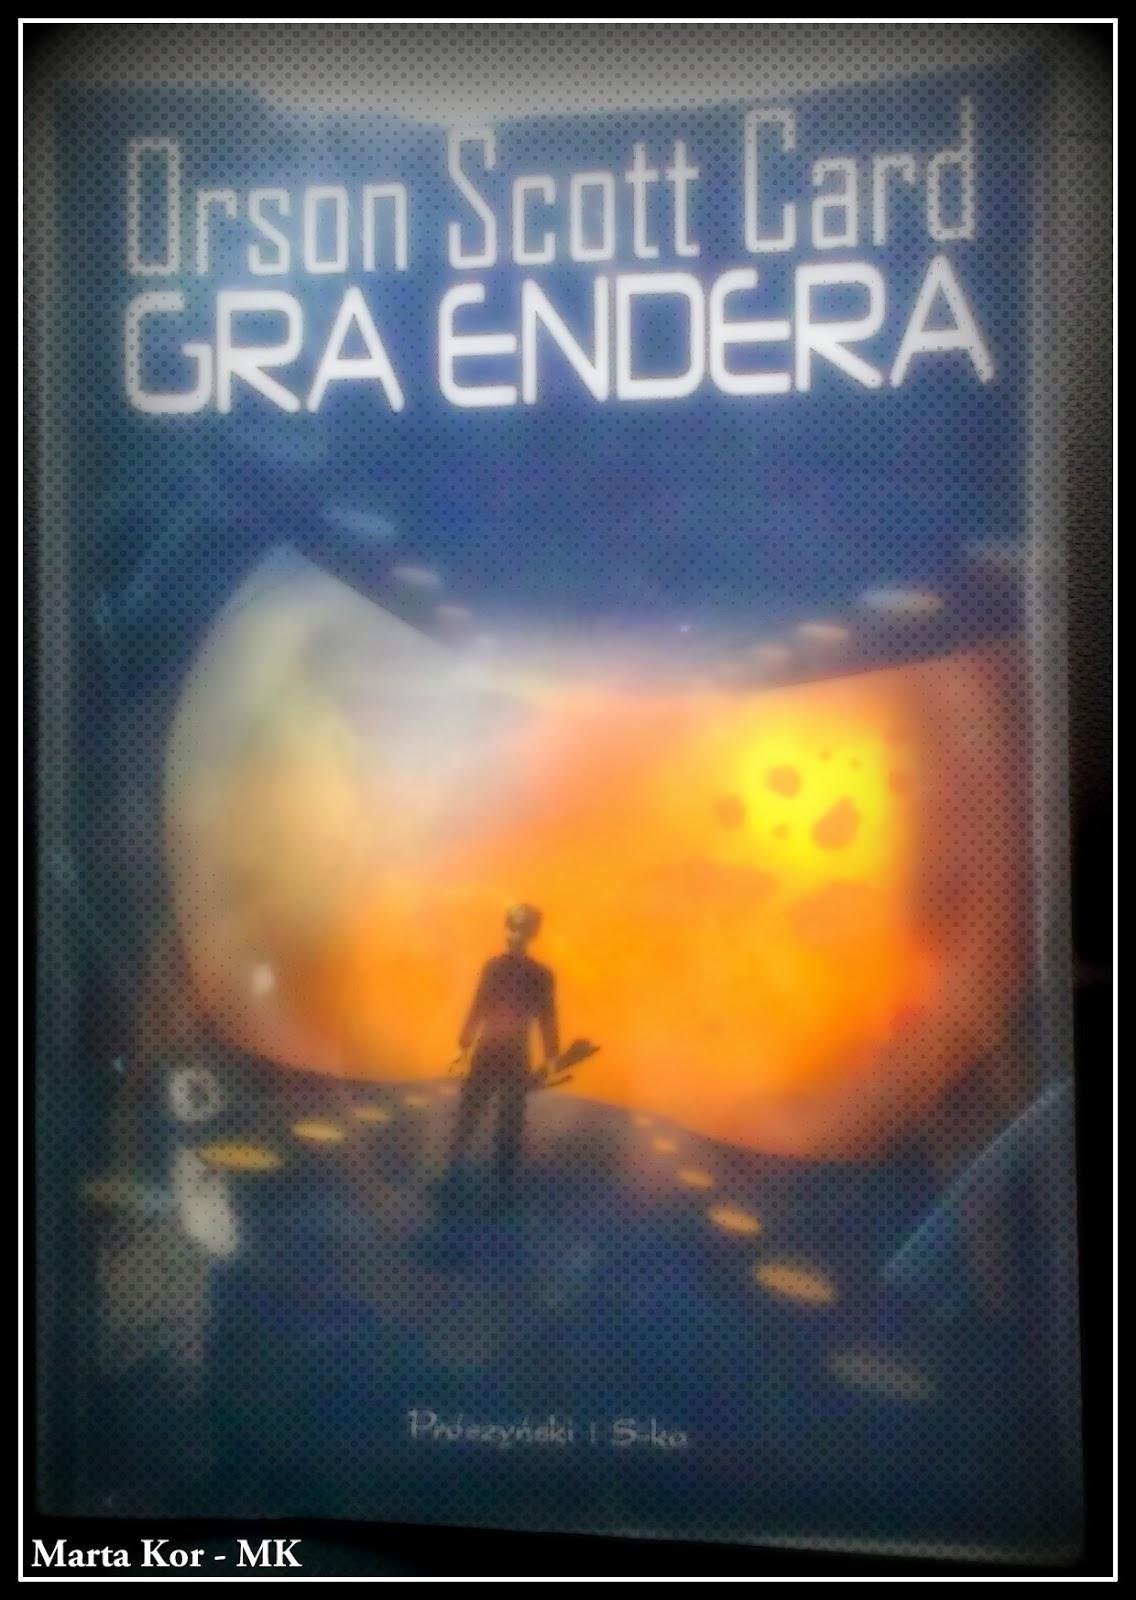 gra-endera-orson-scott-card